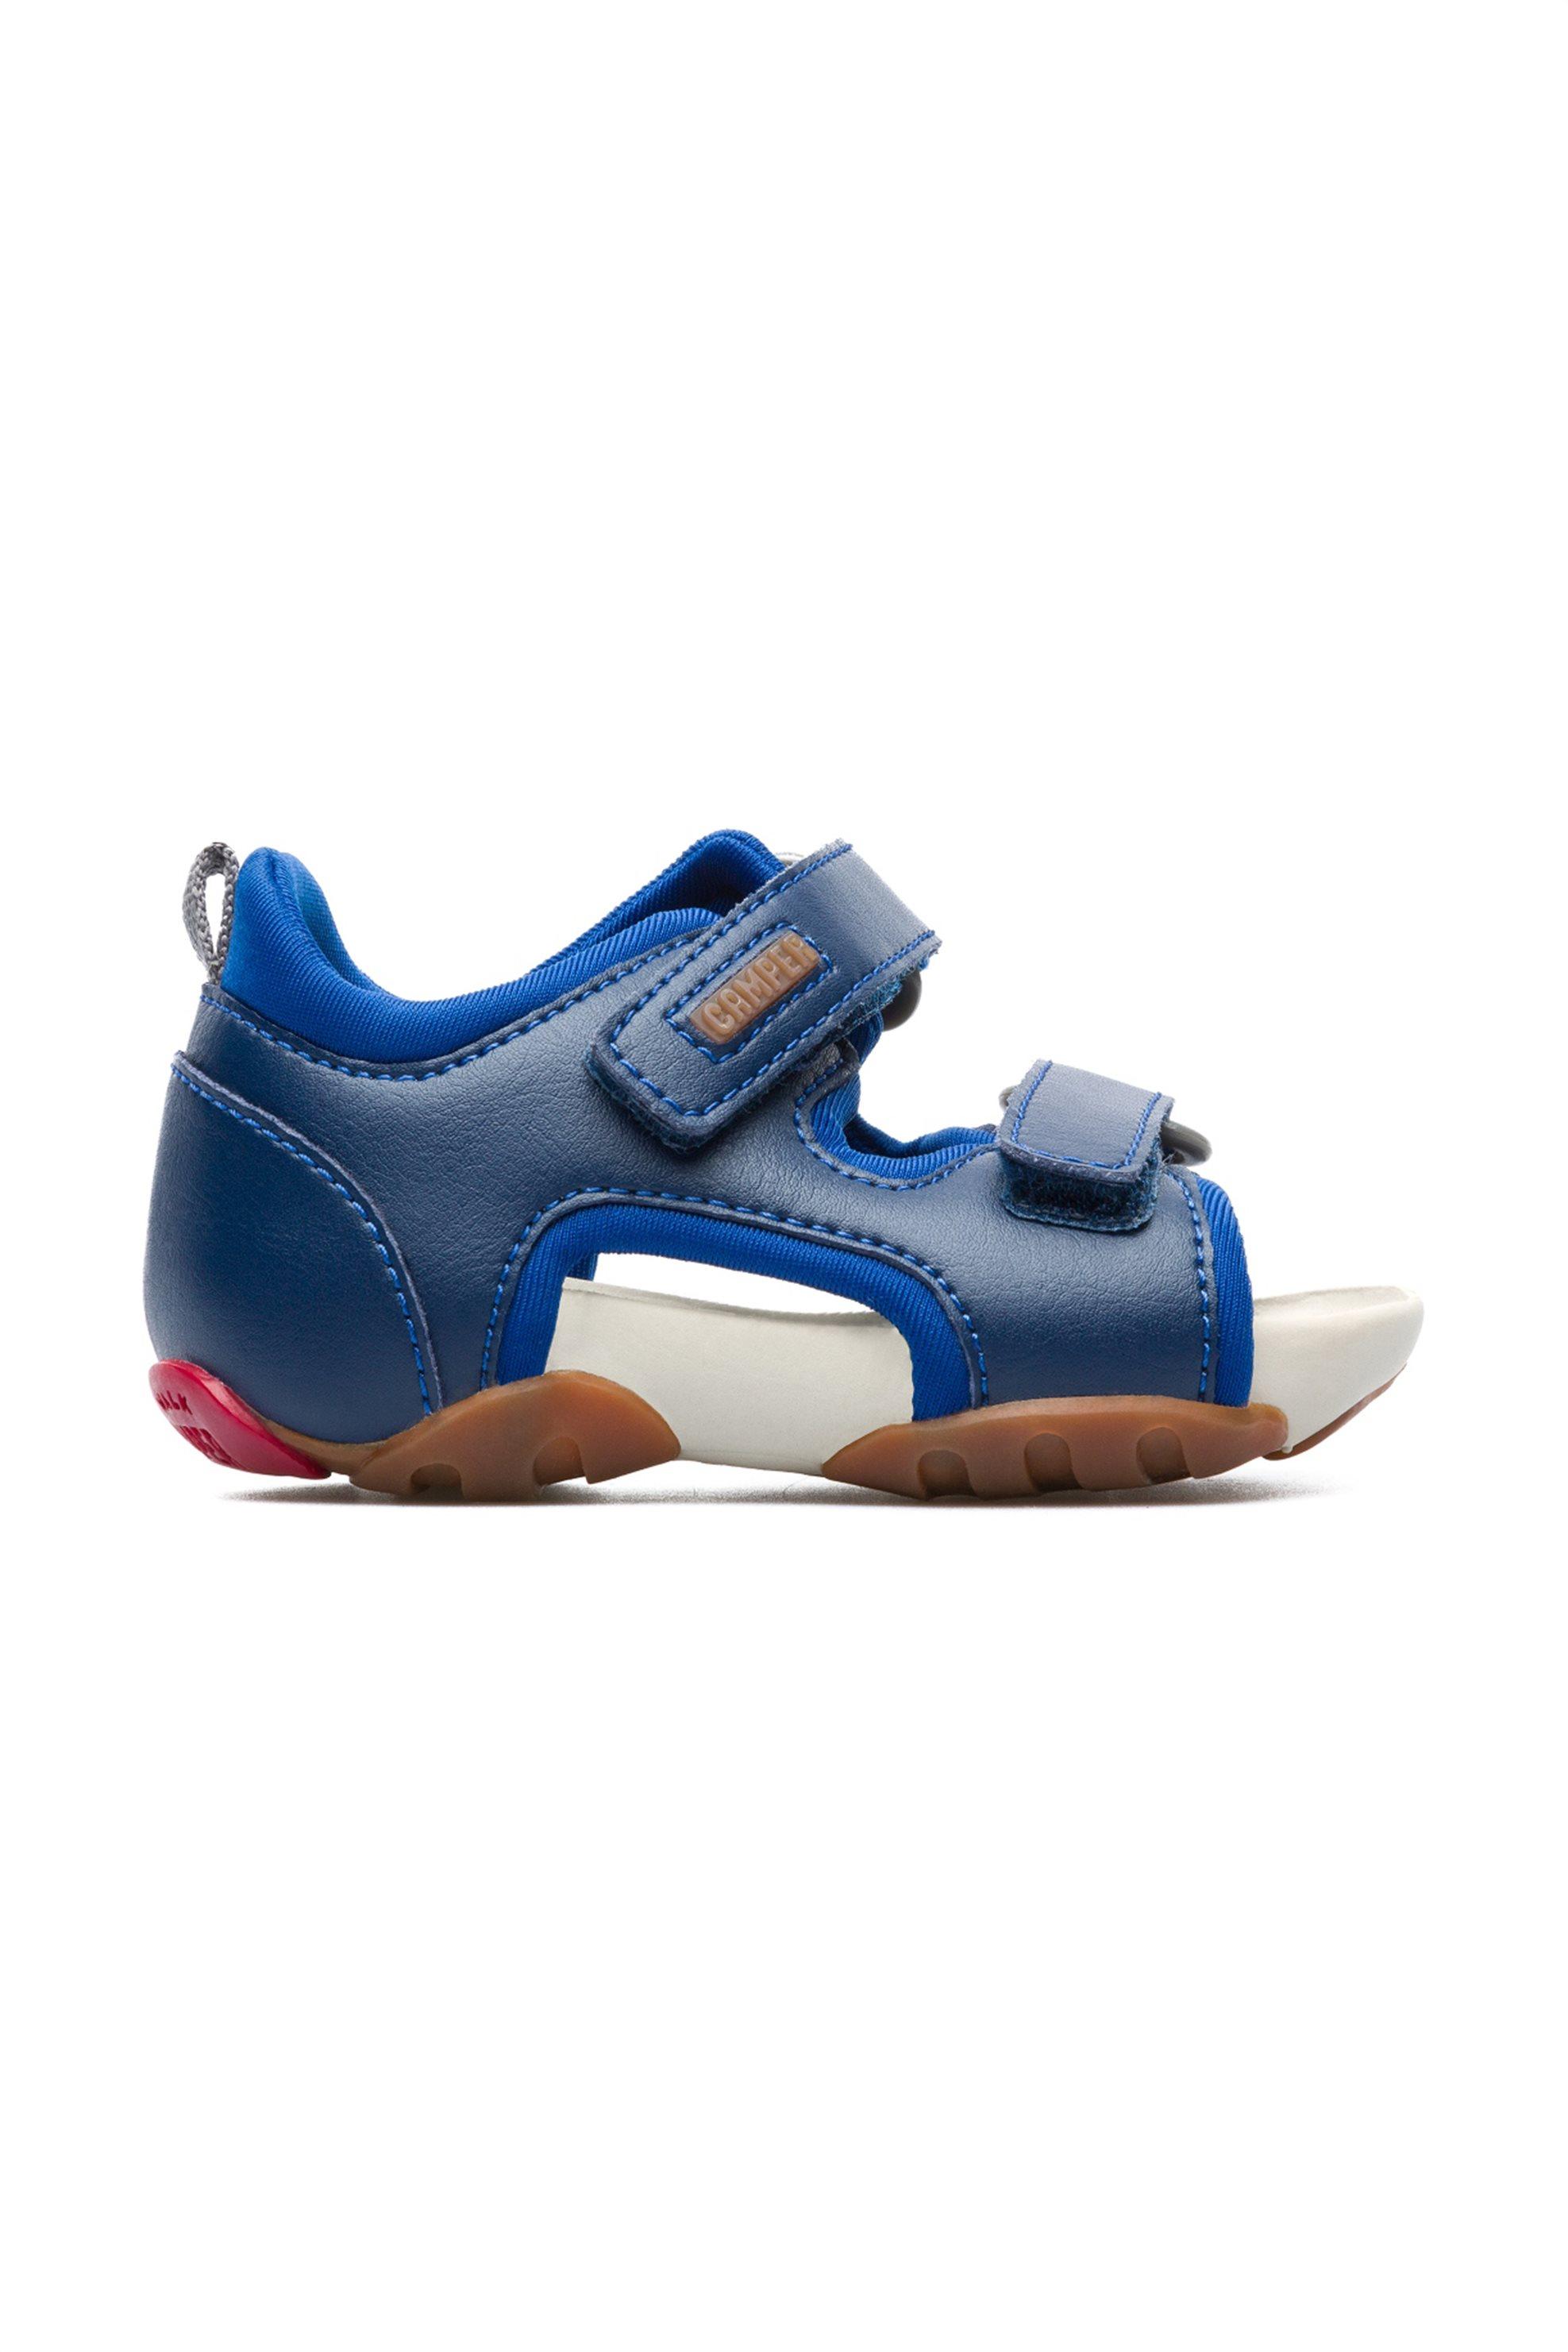 ce5702bed9b Notos Camper βρεφικά σανδάλια Ous – 80530-033 – Μπλε